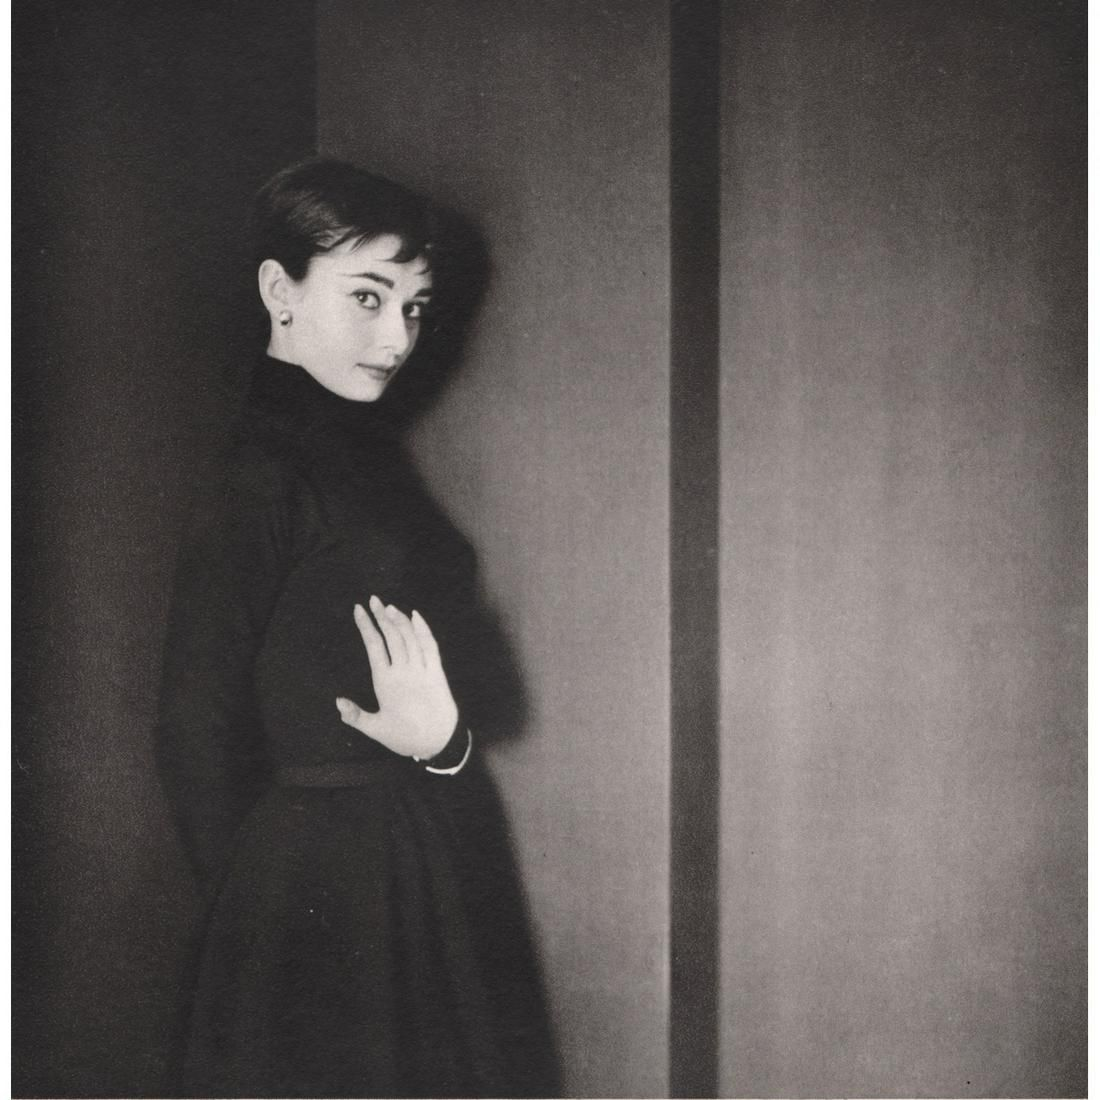 CECIL BEATON - Audrey Hepburn, 1954